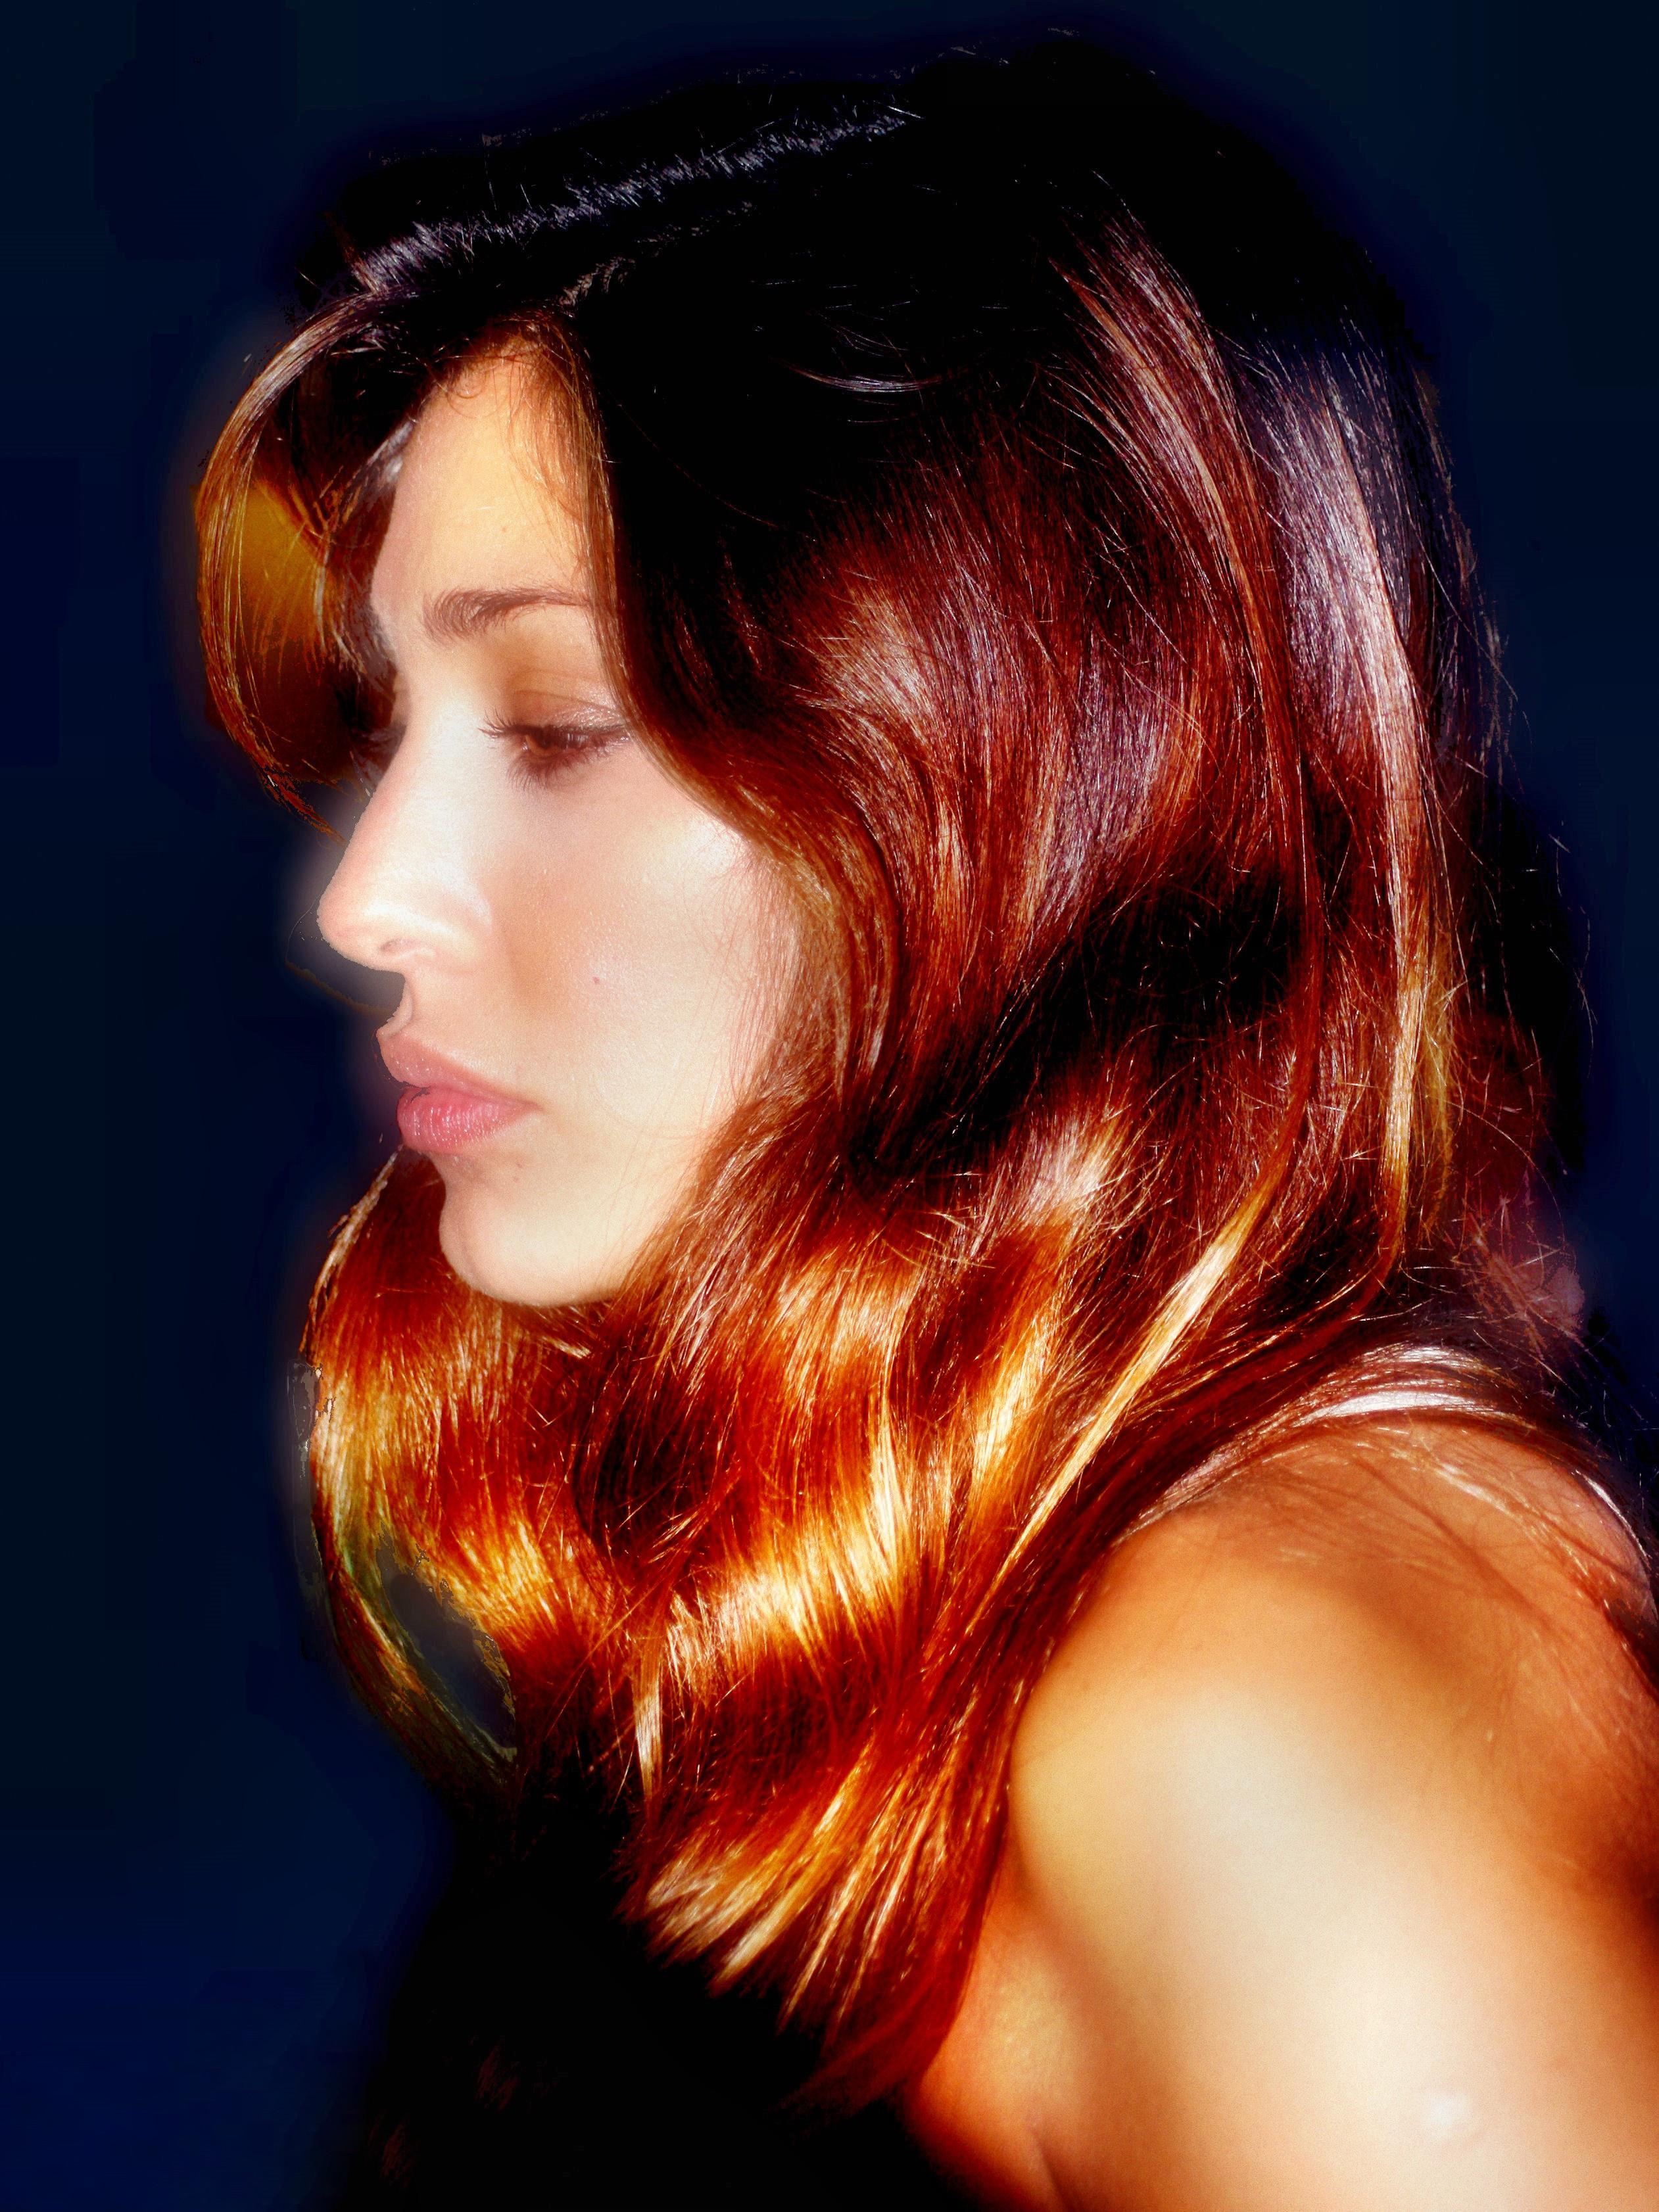 Descrizione Belen Rodriguez 1.jpg